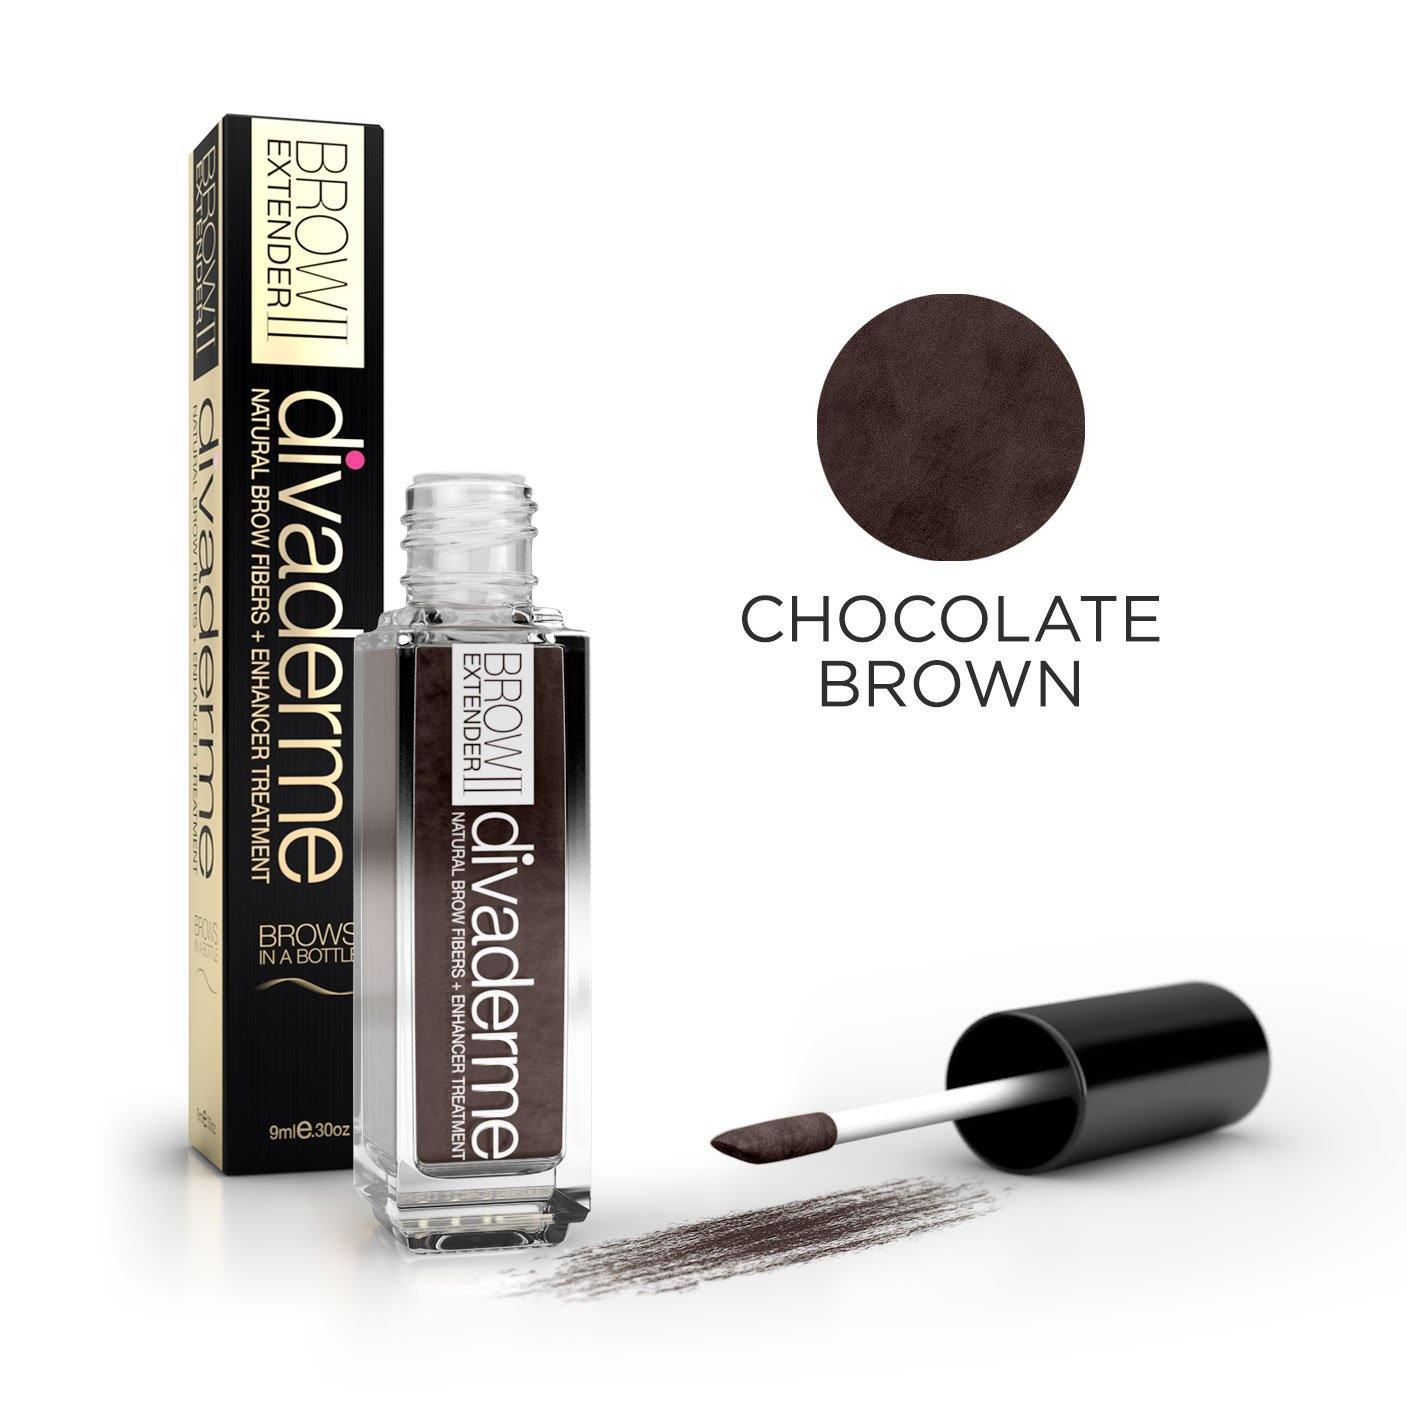 divaderme Brow Extender II, 100% Natural Semi Permanent, Eyebrow Fibers, Enhancer Treatment, Chocolate Brown